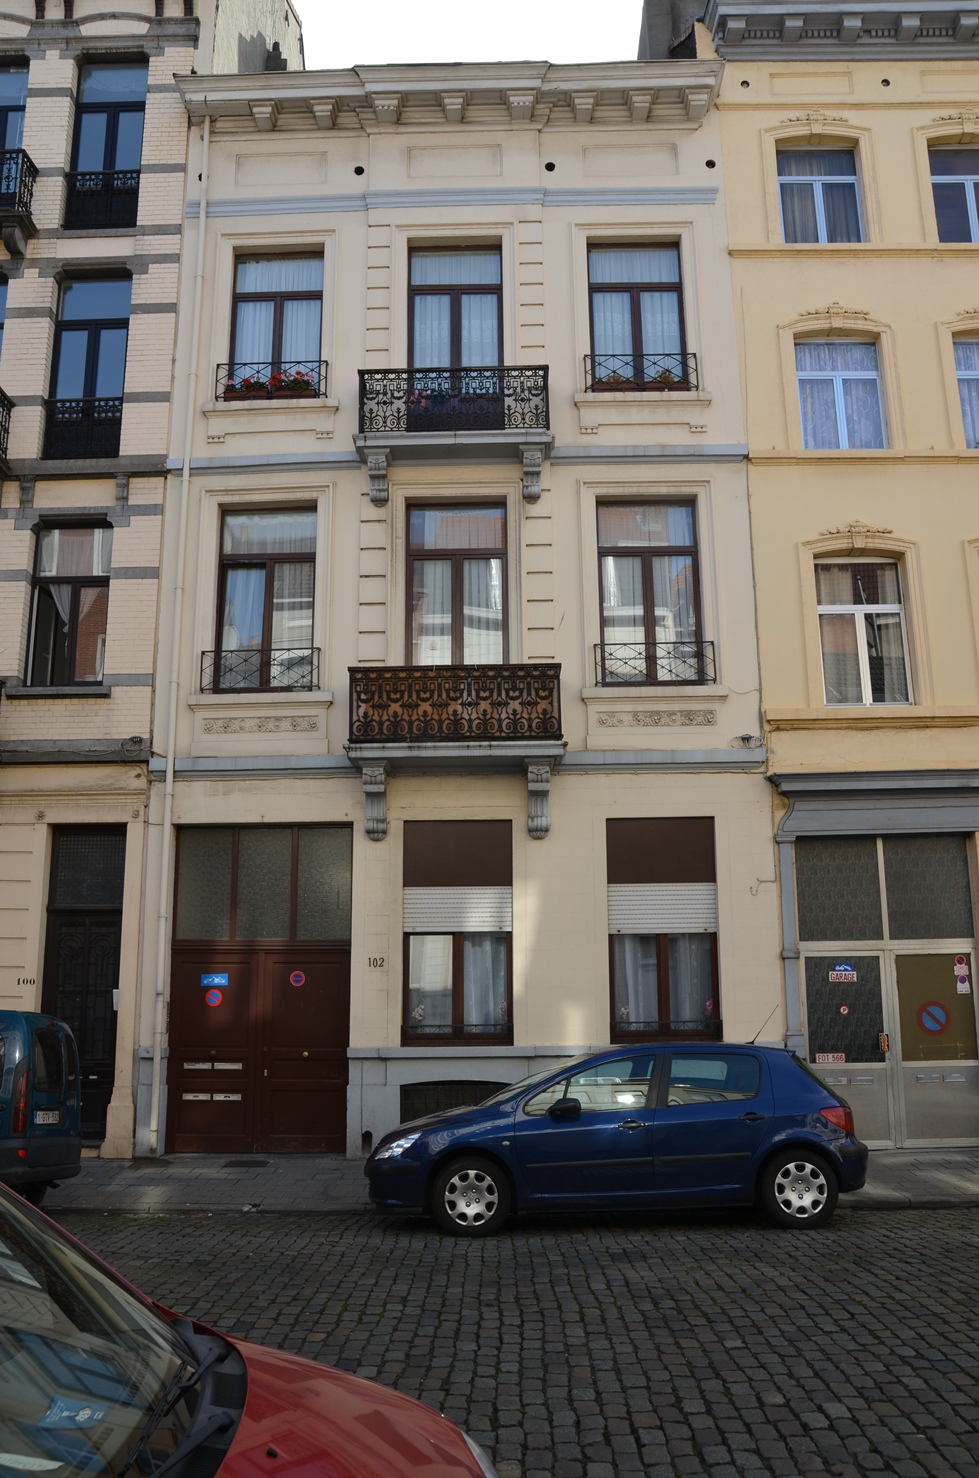 Rue de la Senne 102, 2015